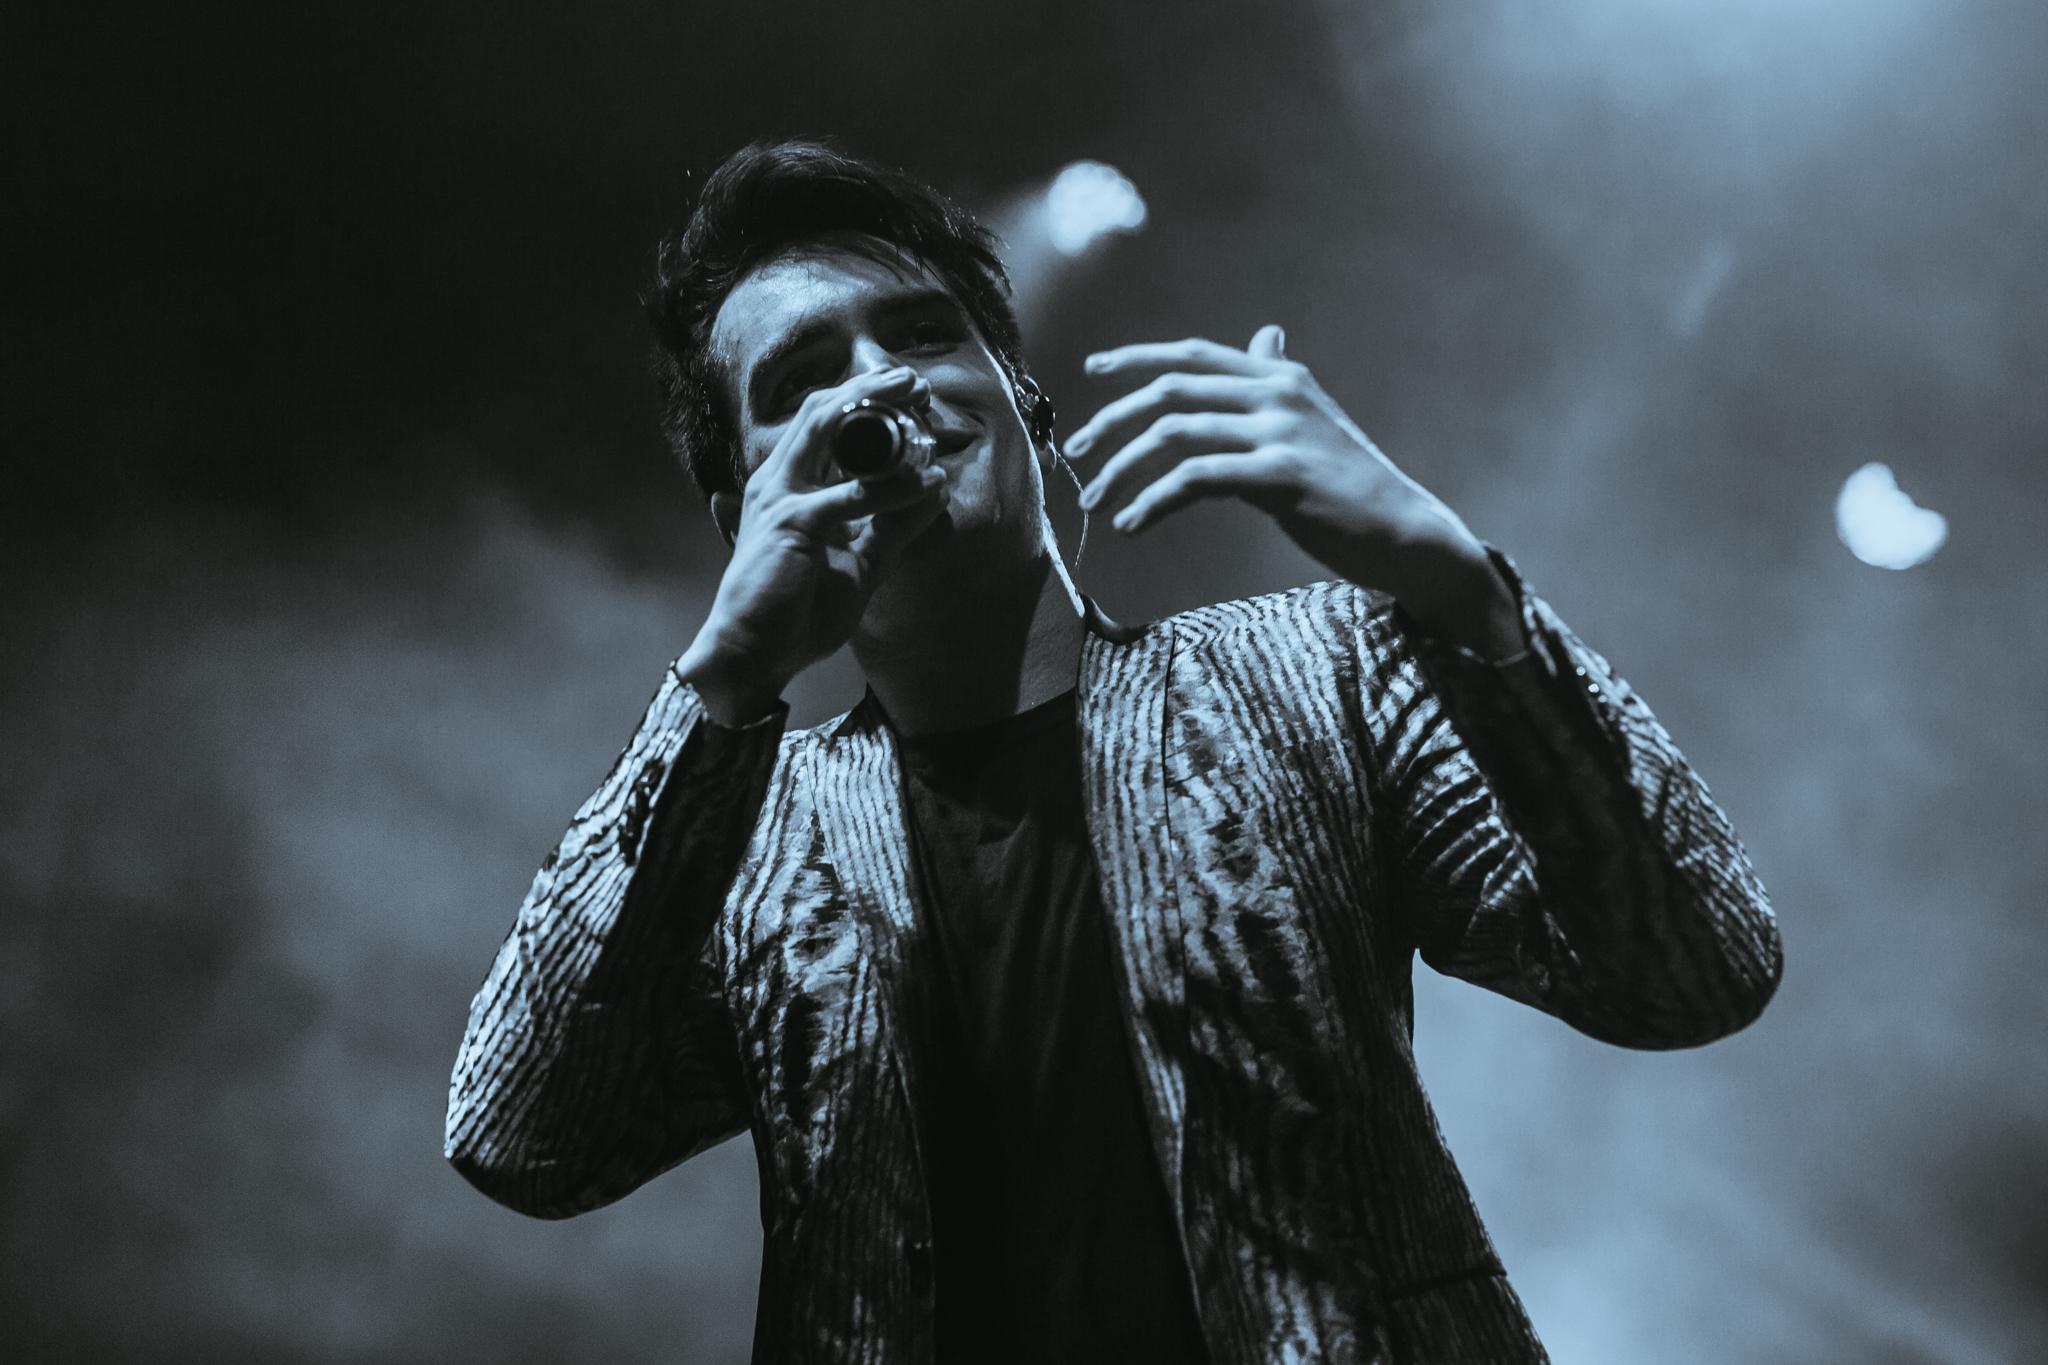 Mitch Lowe Photo - Panic At The Disco - Riverstage-38.jpg